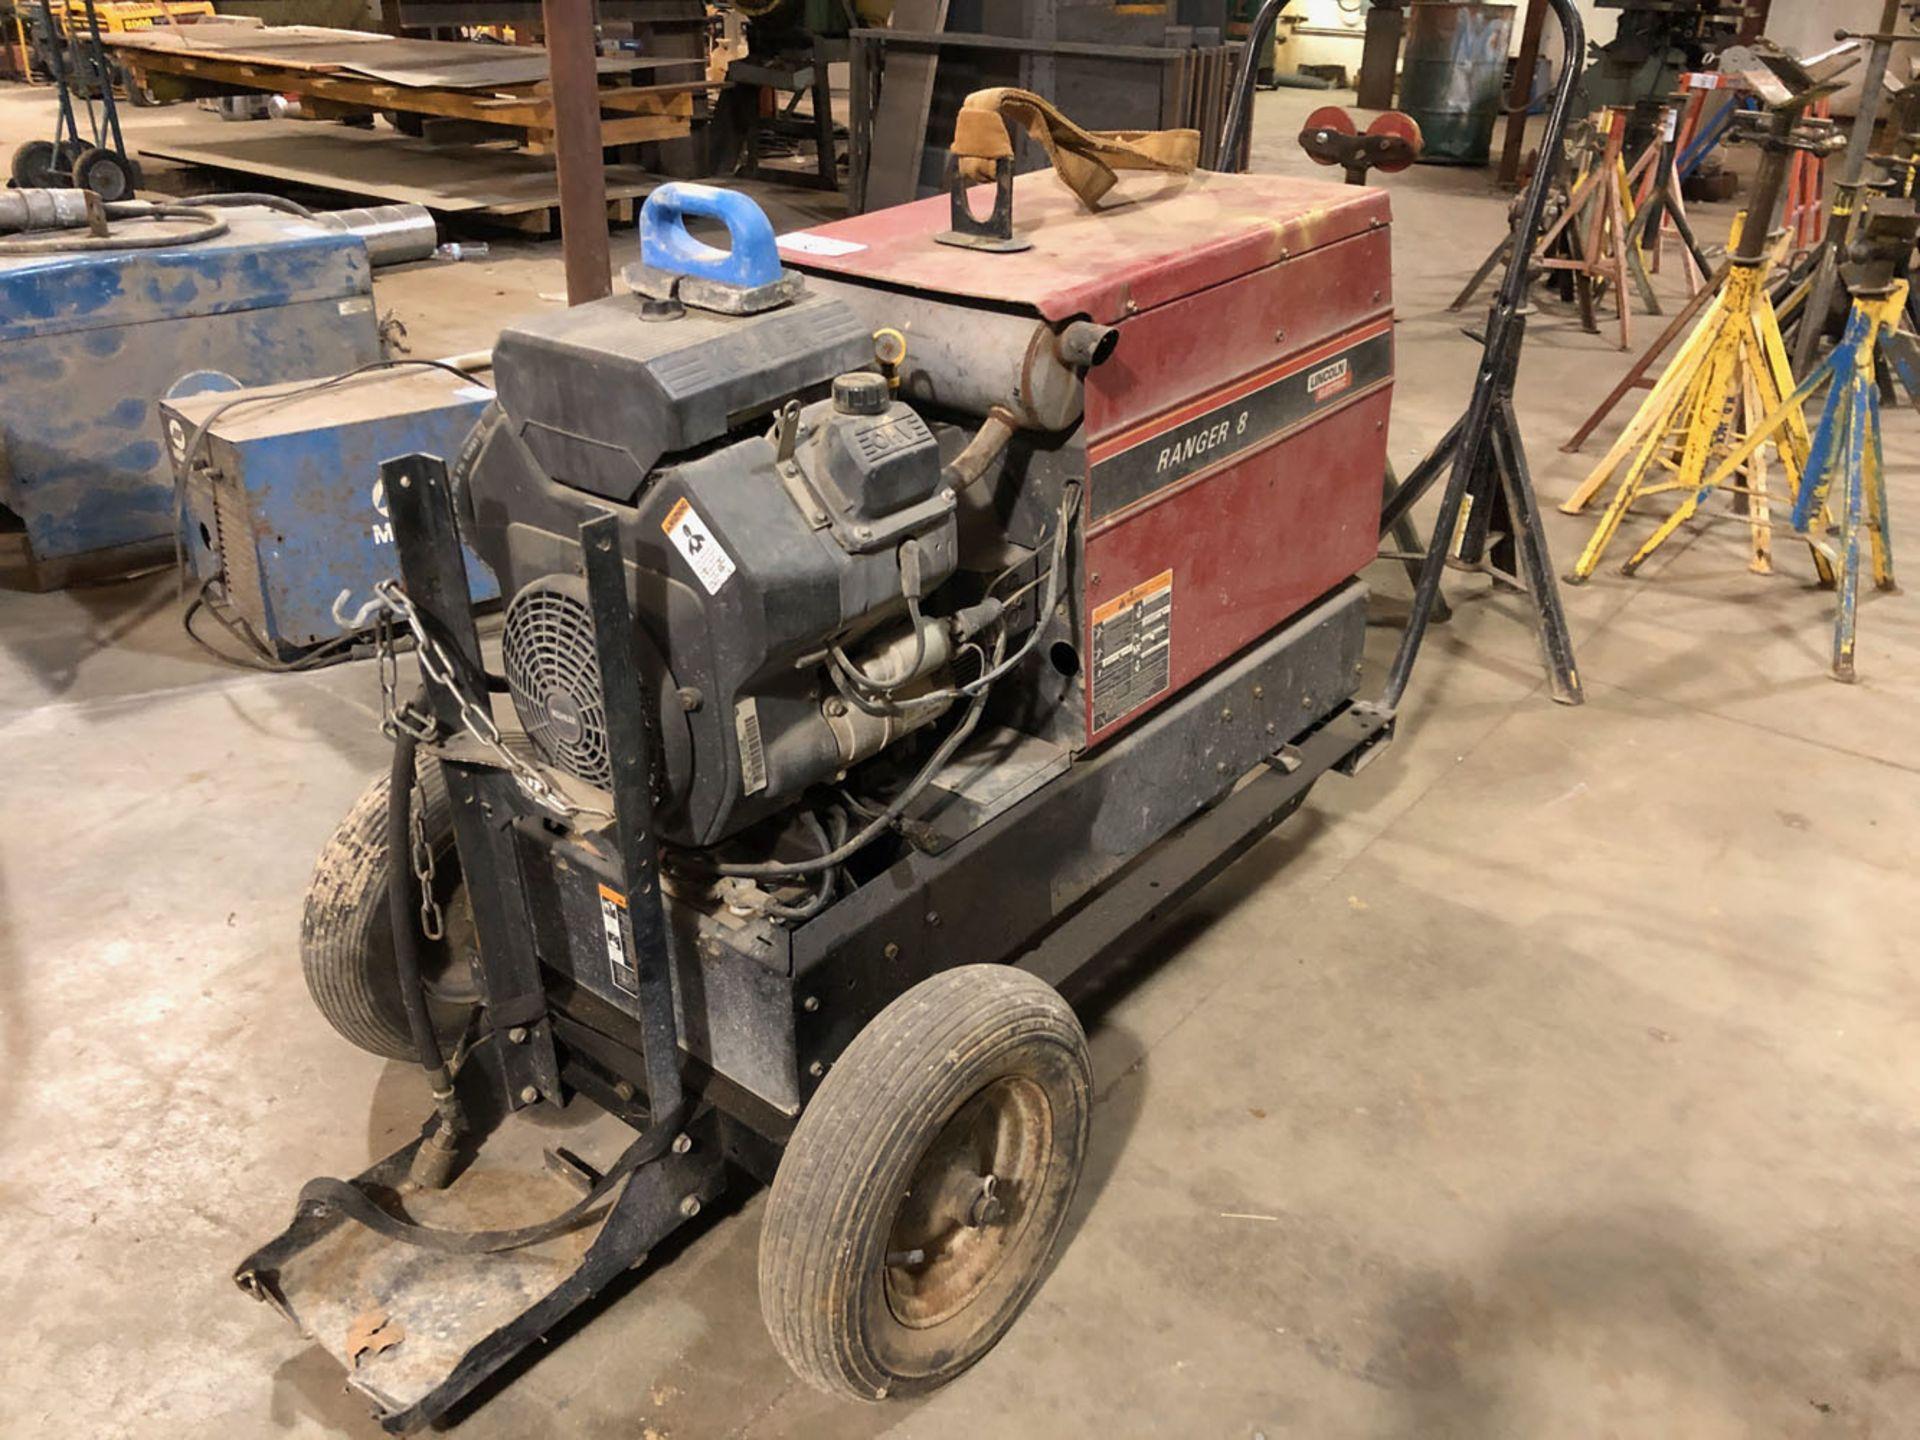 Lot 132 - Welder, Lincoln Ranger 8 Gas Powered